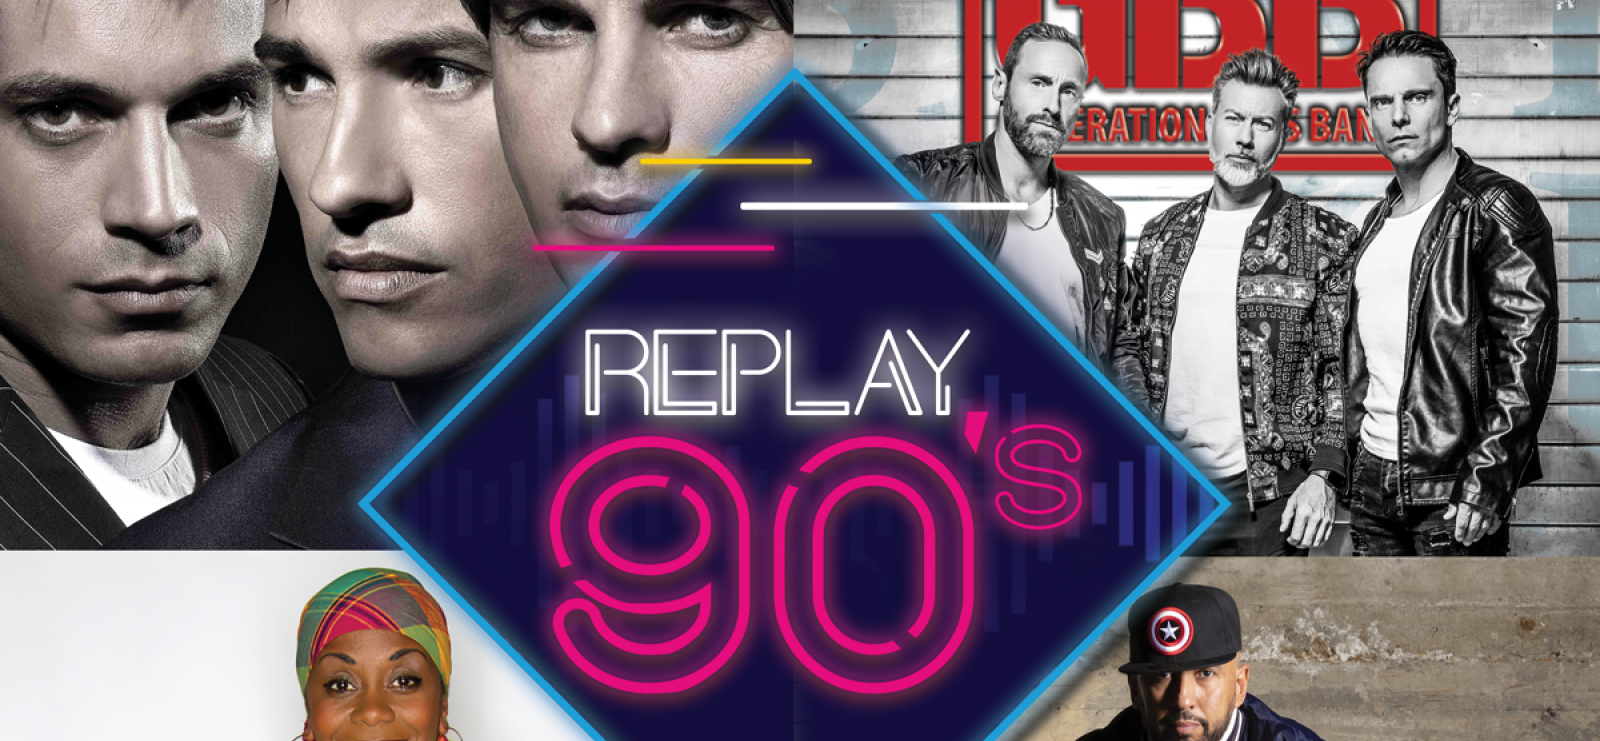 Concert Événement Replay 90's